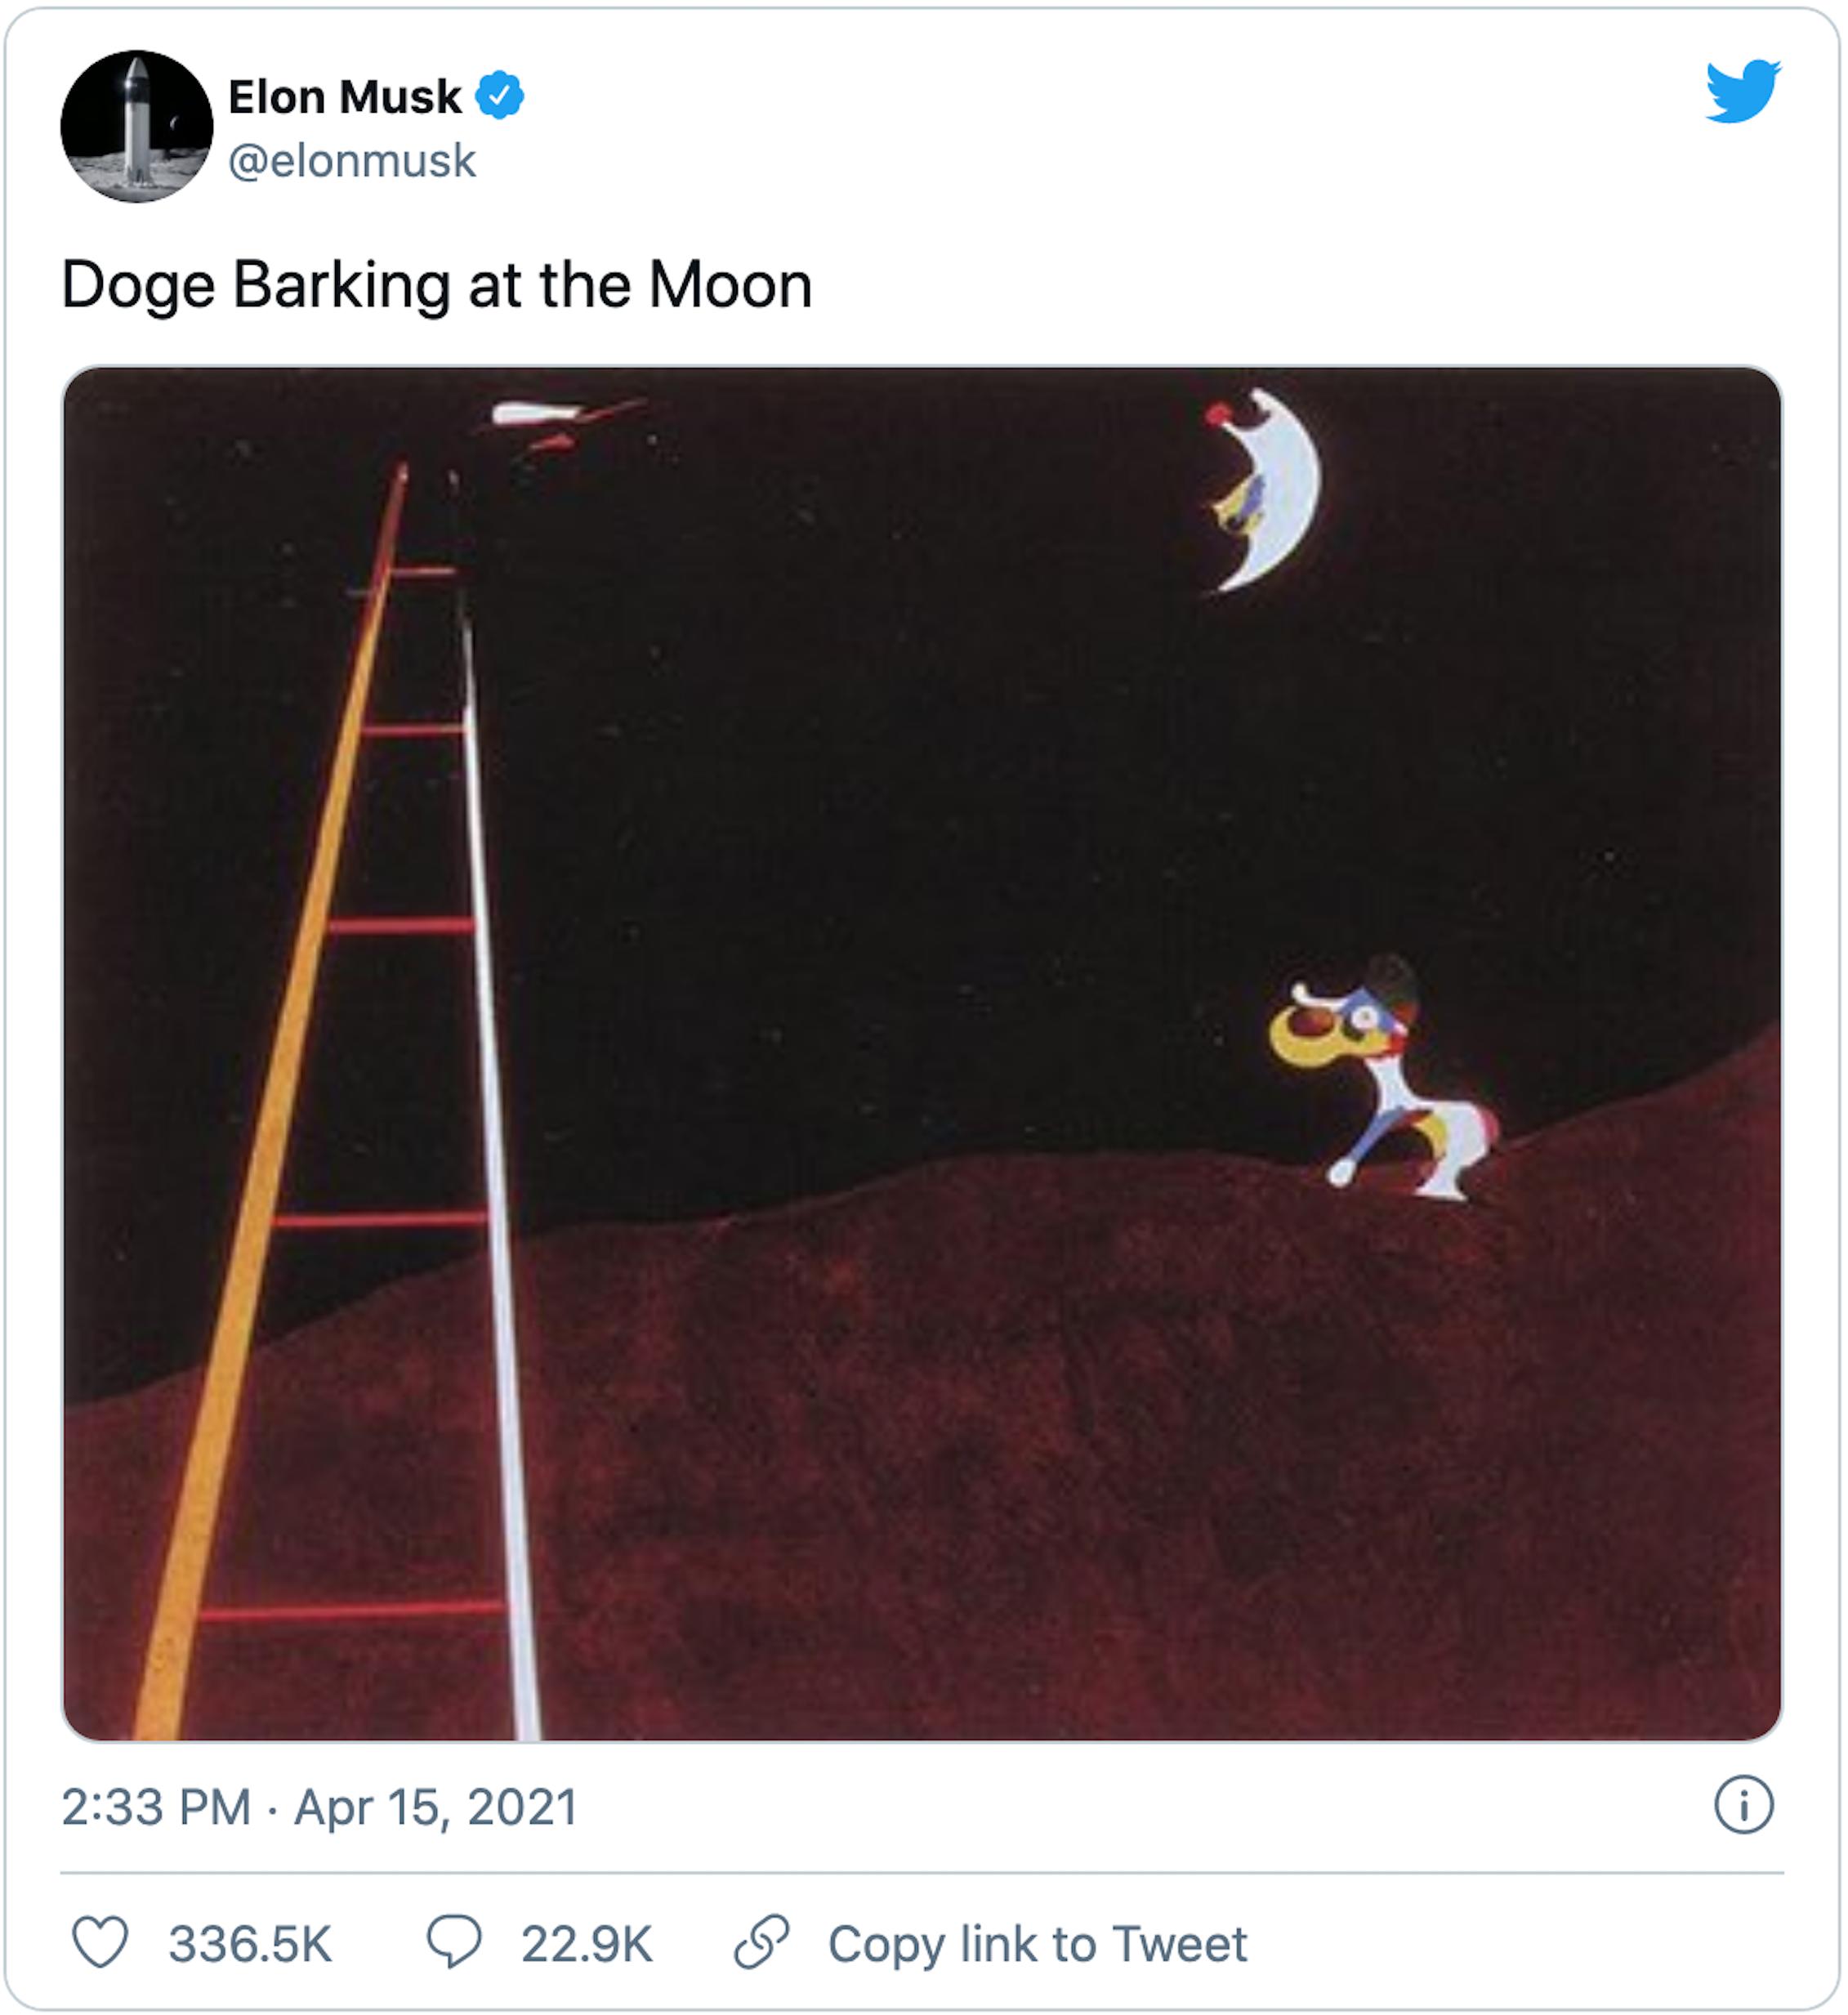 Elon Musk's social media posts move markets.